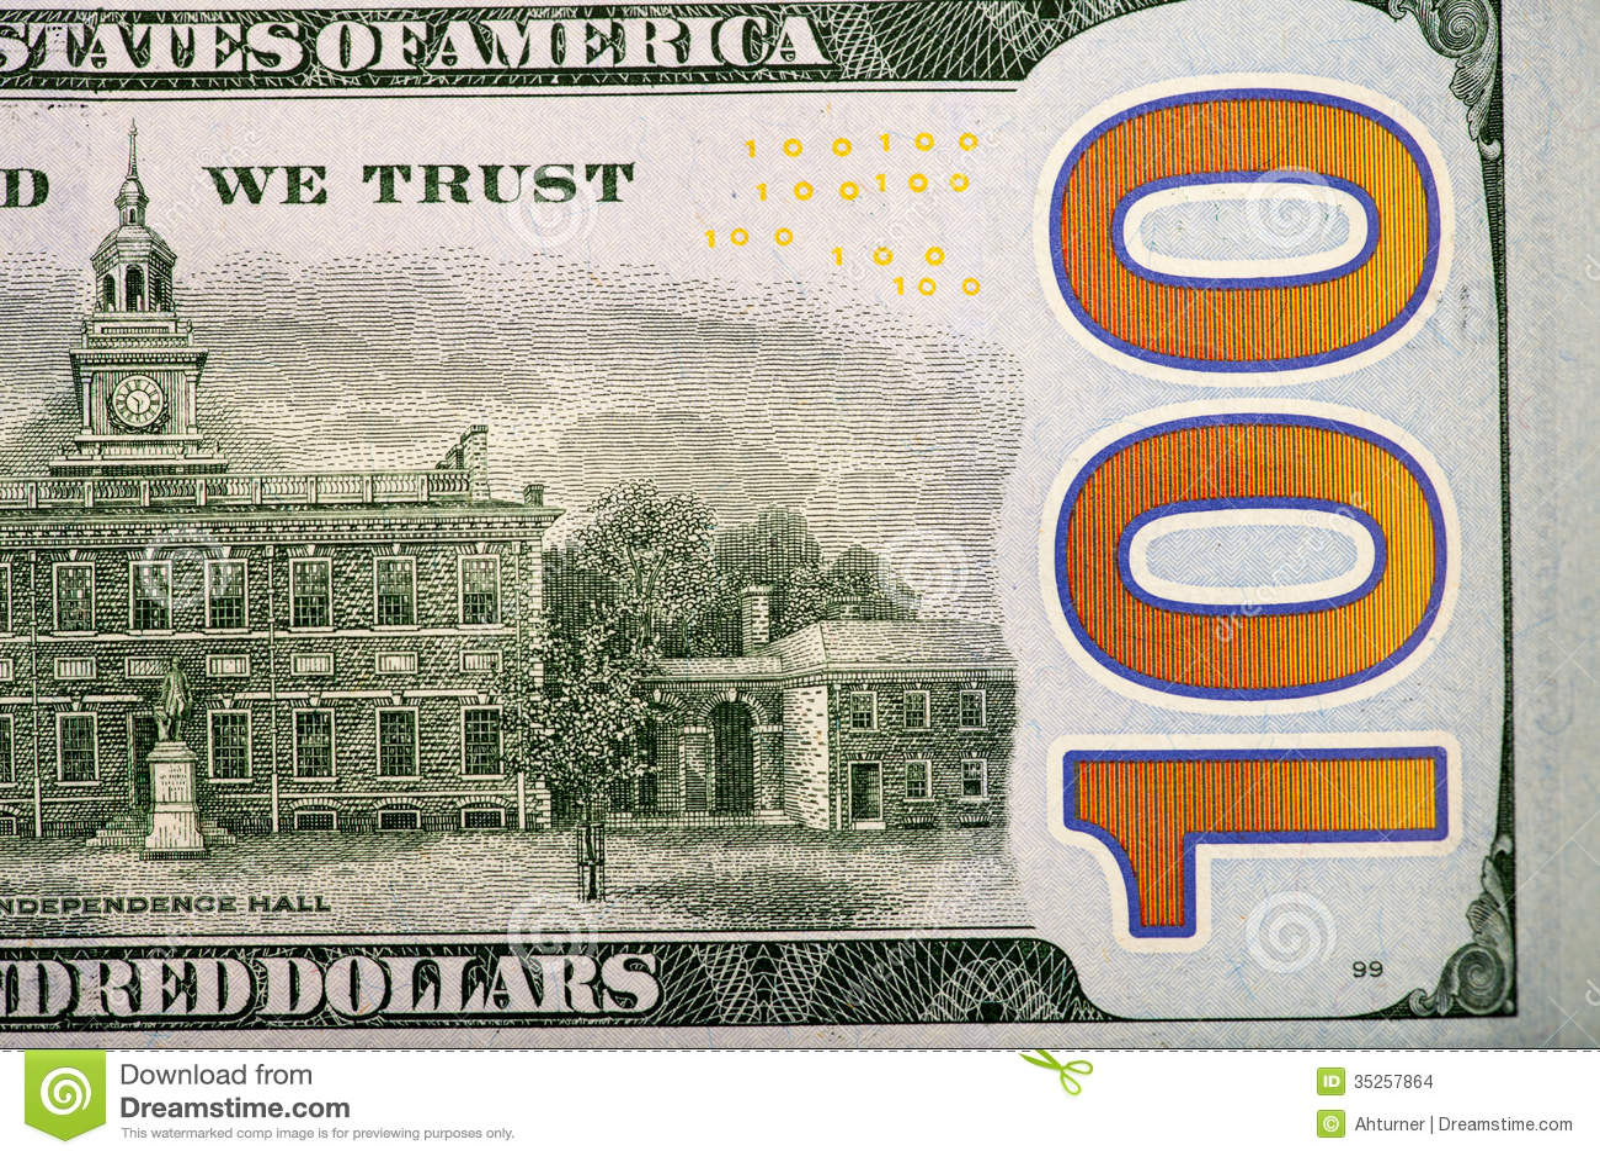 100 Dollar Bill Folded Money Business Cards. snakes Cobras graphics ...